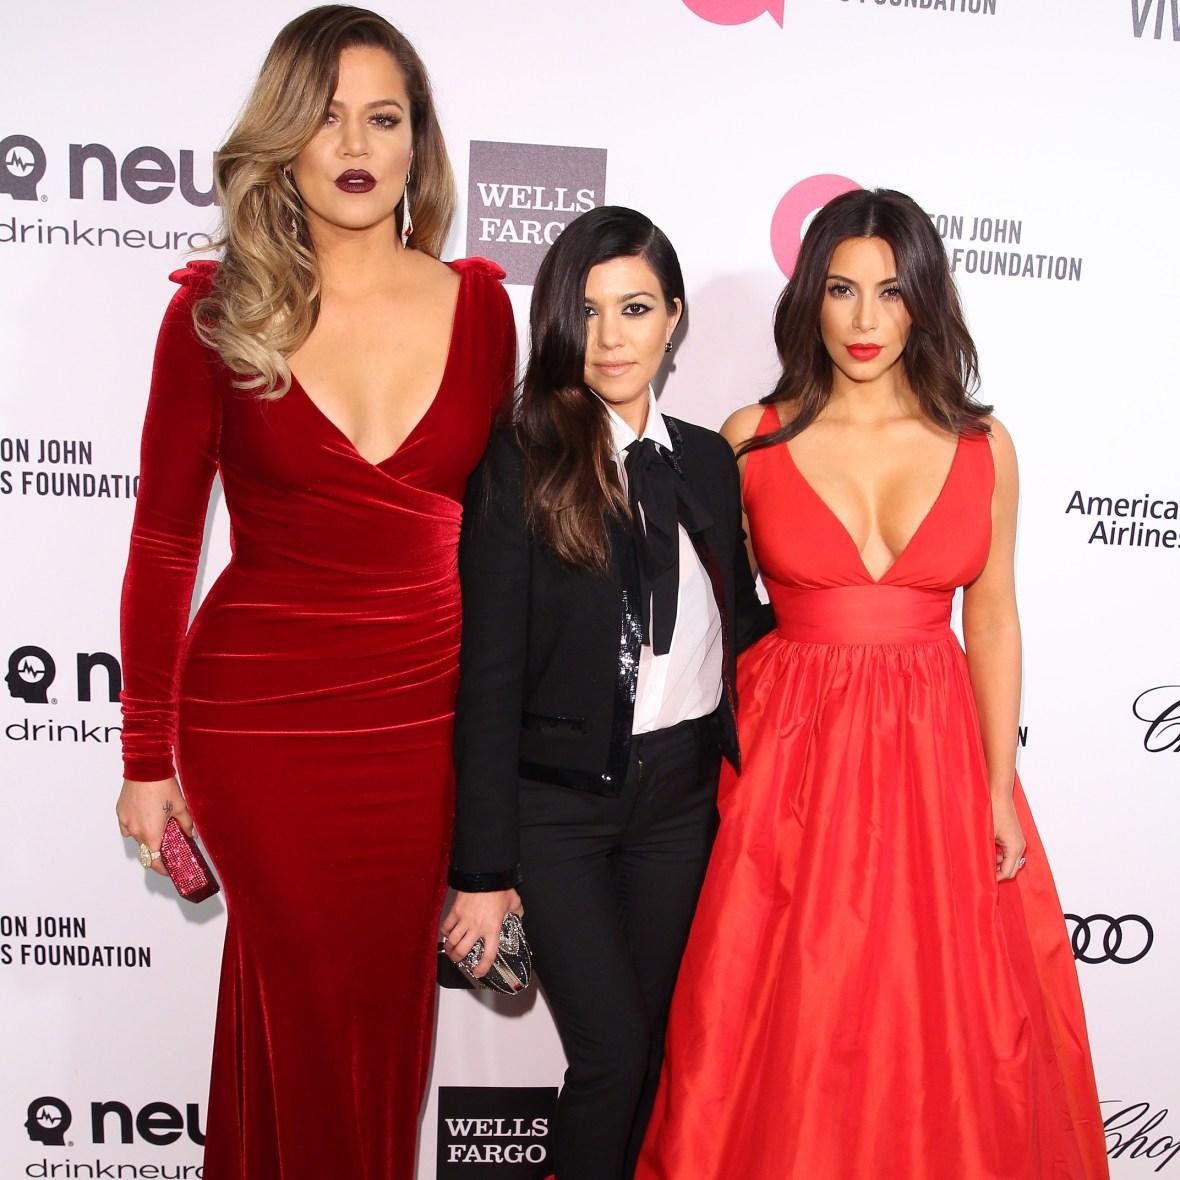 kardashians getty images